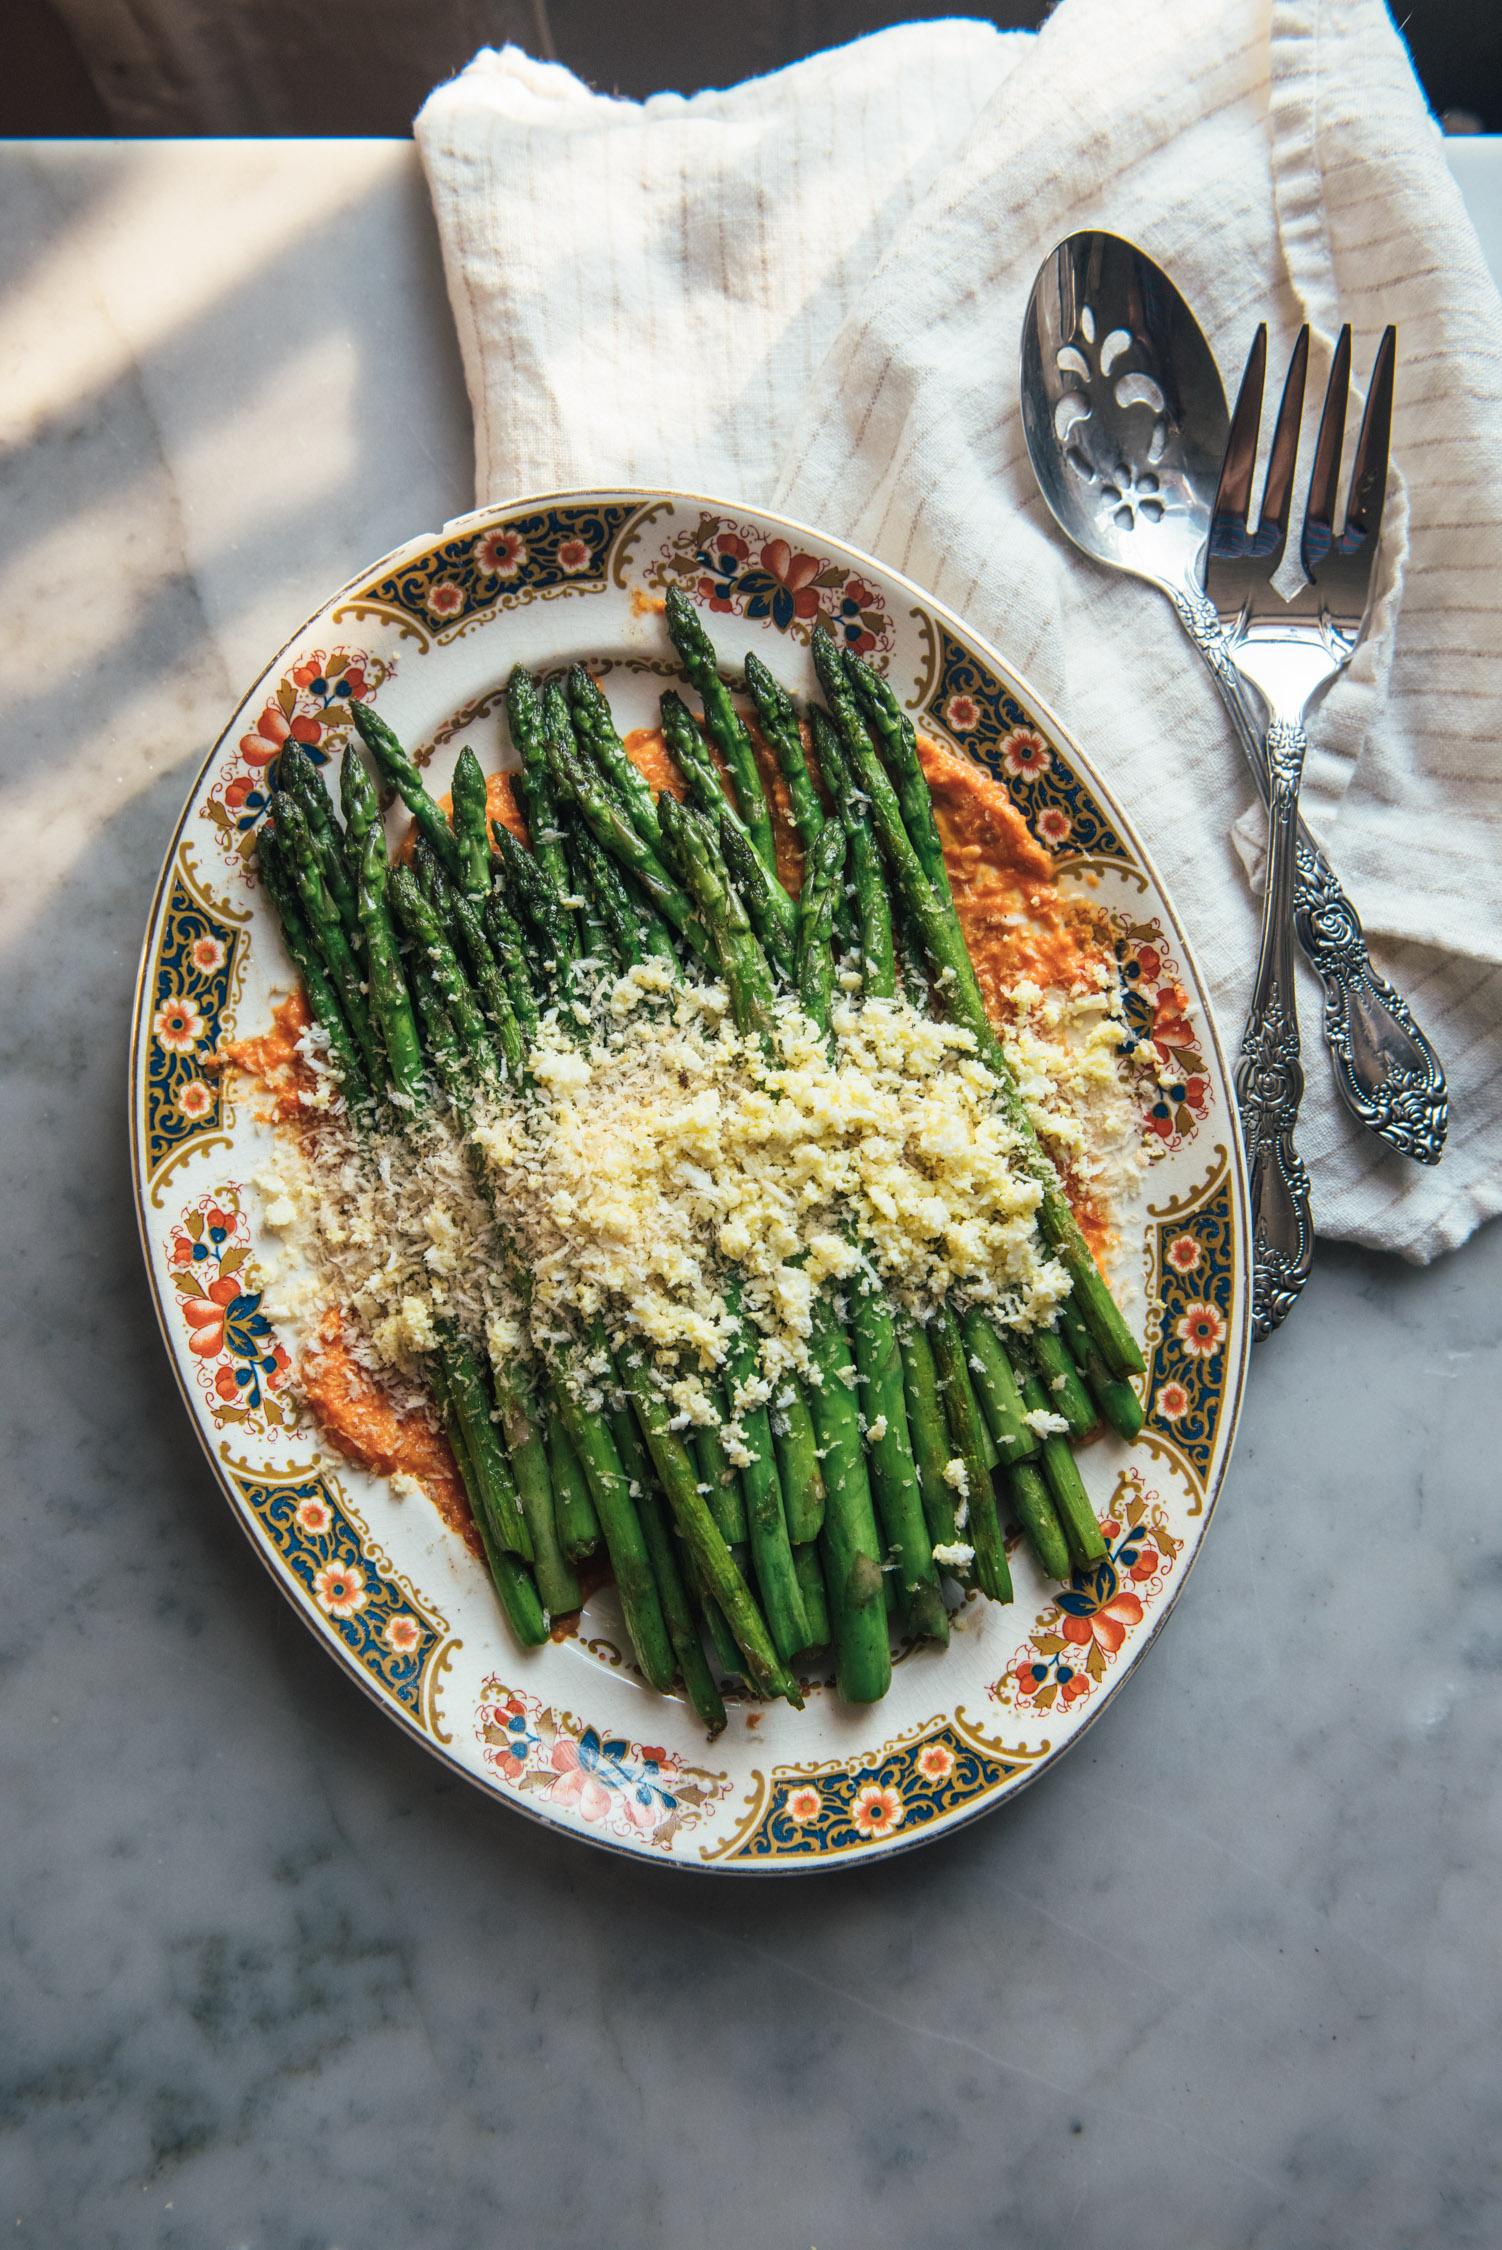 Pan Fried Asparagus with Romesco Sauce